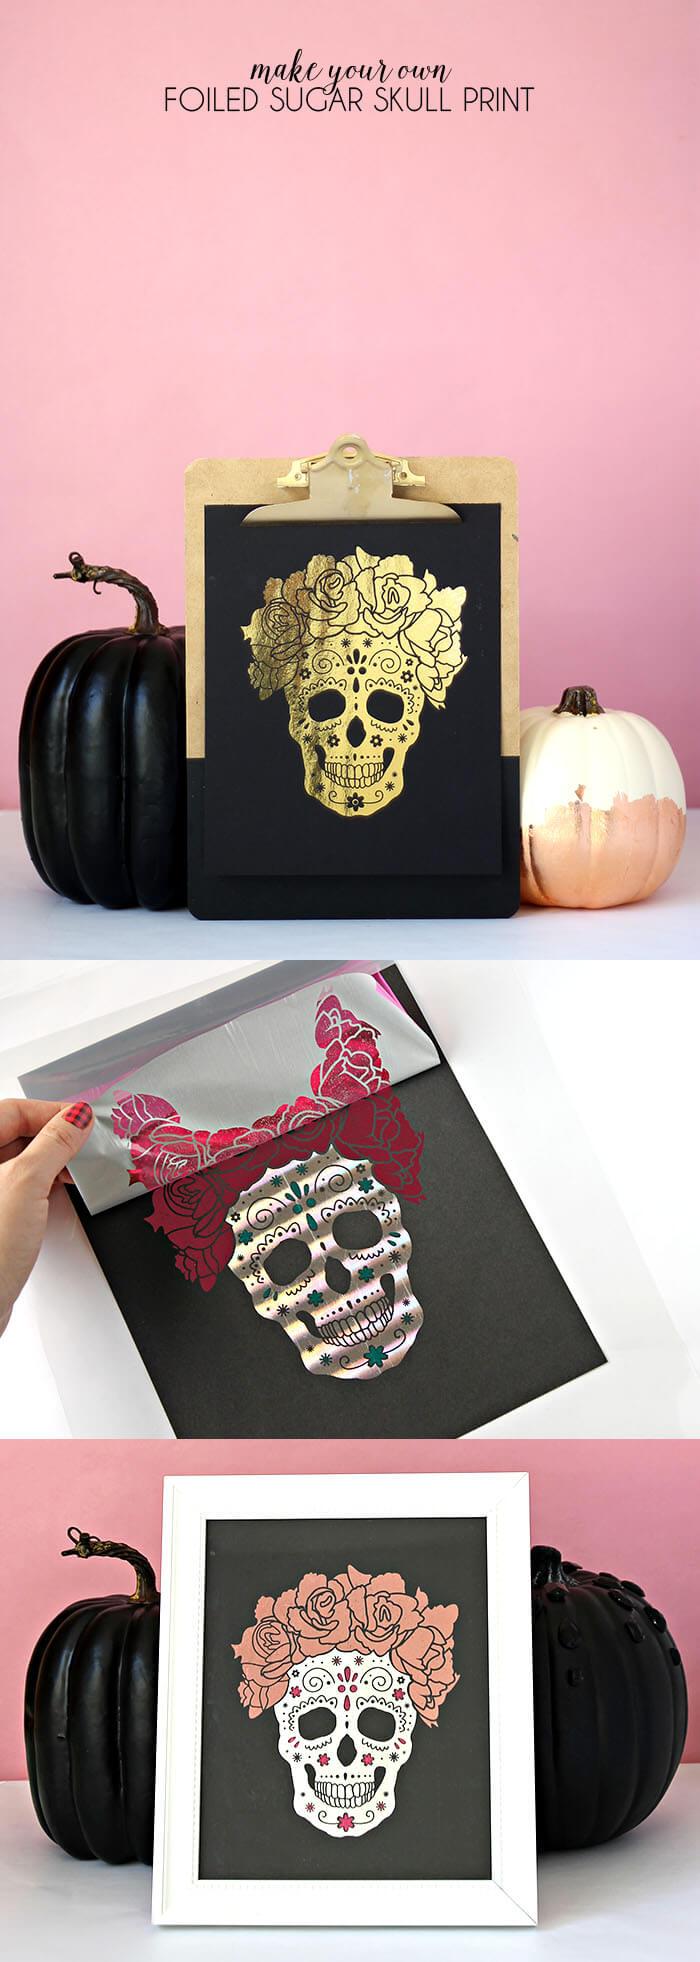 make your own foiled sugar skull prints - free download